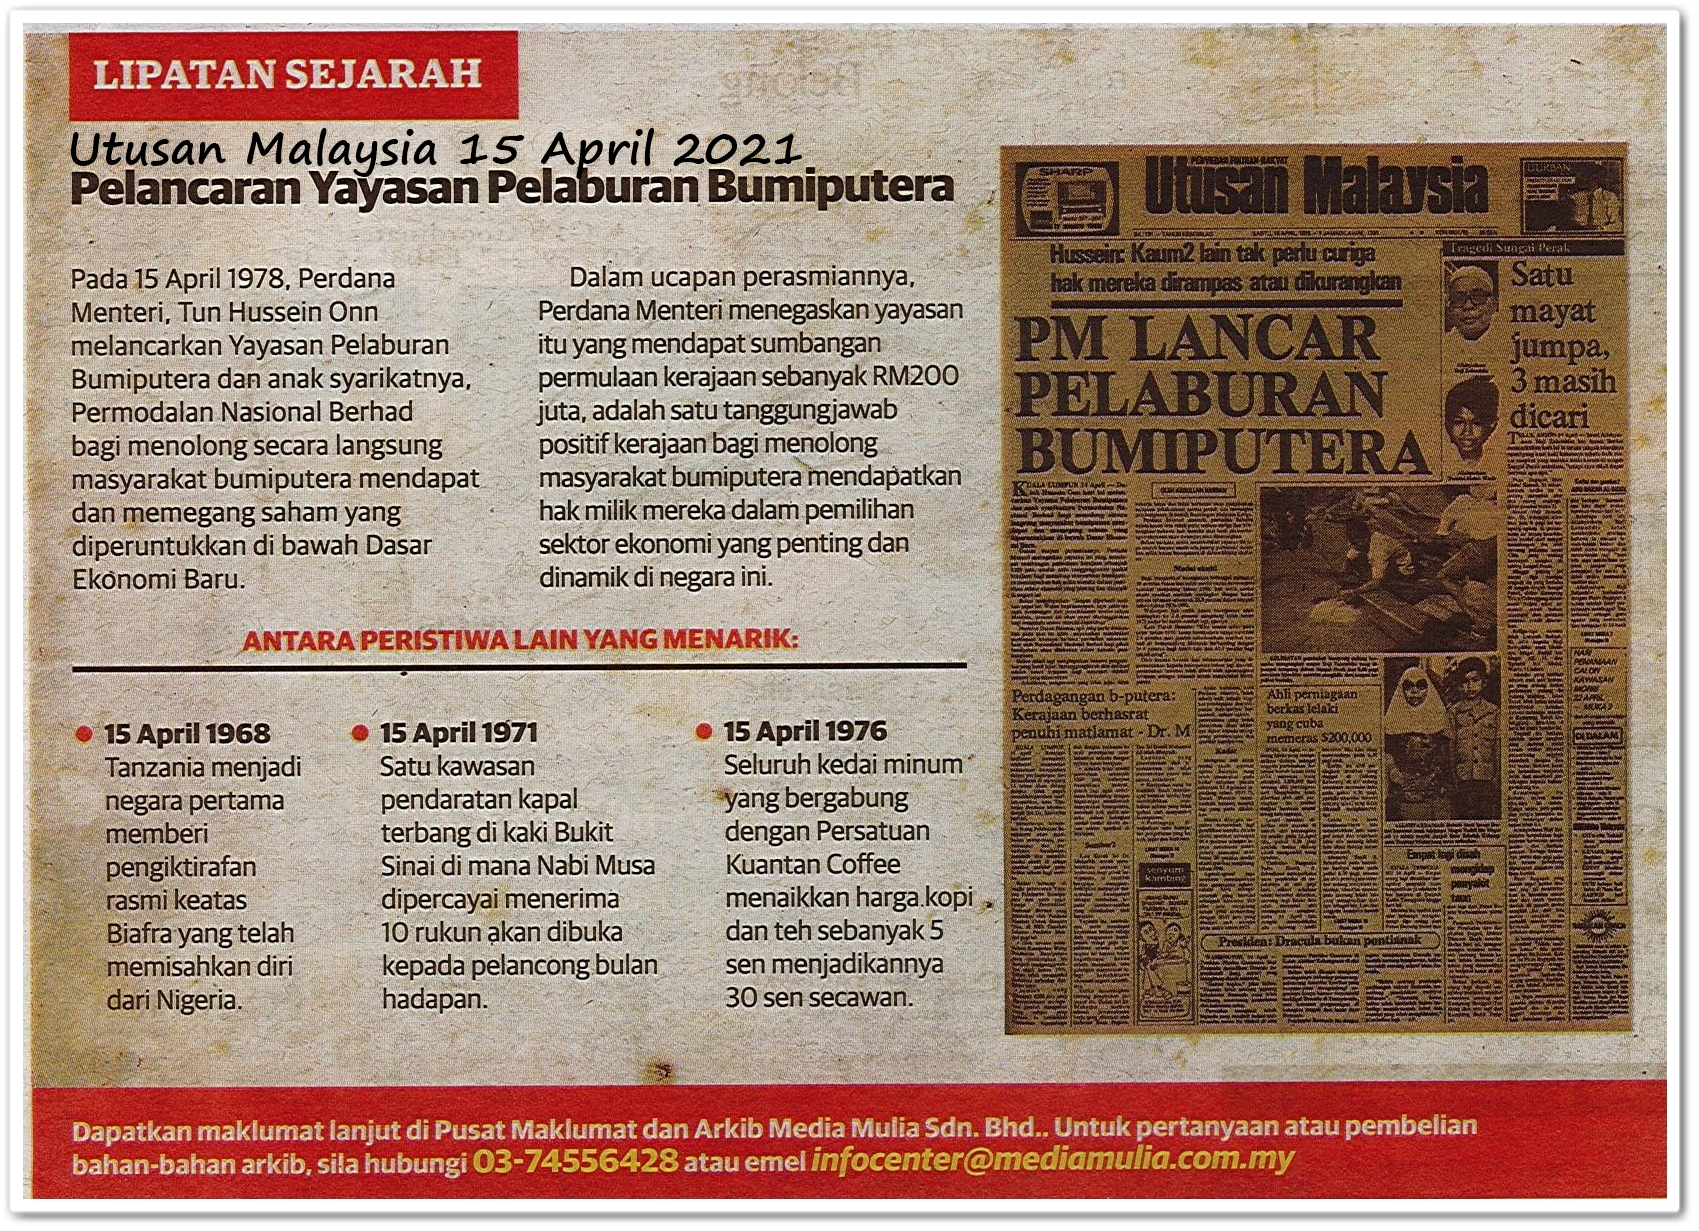 Lipatan sejarah 15 April - Keratan akhbar Utusan Malaysia 15 April 2021